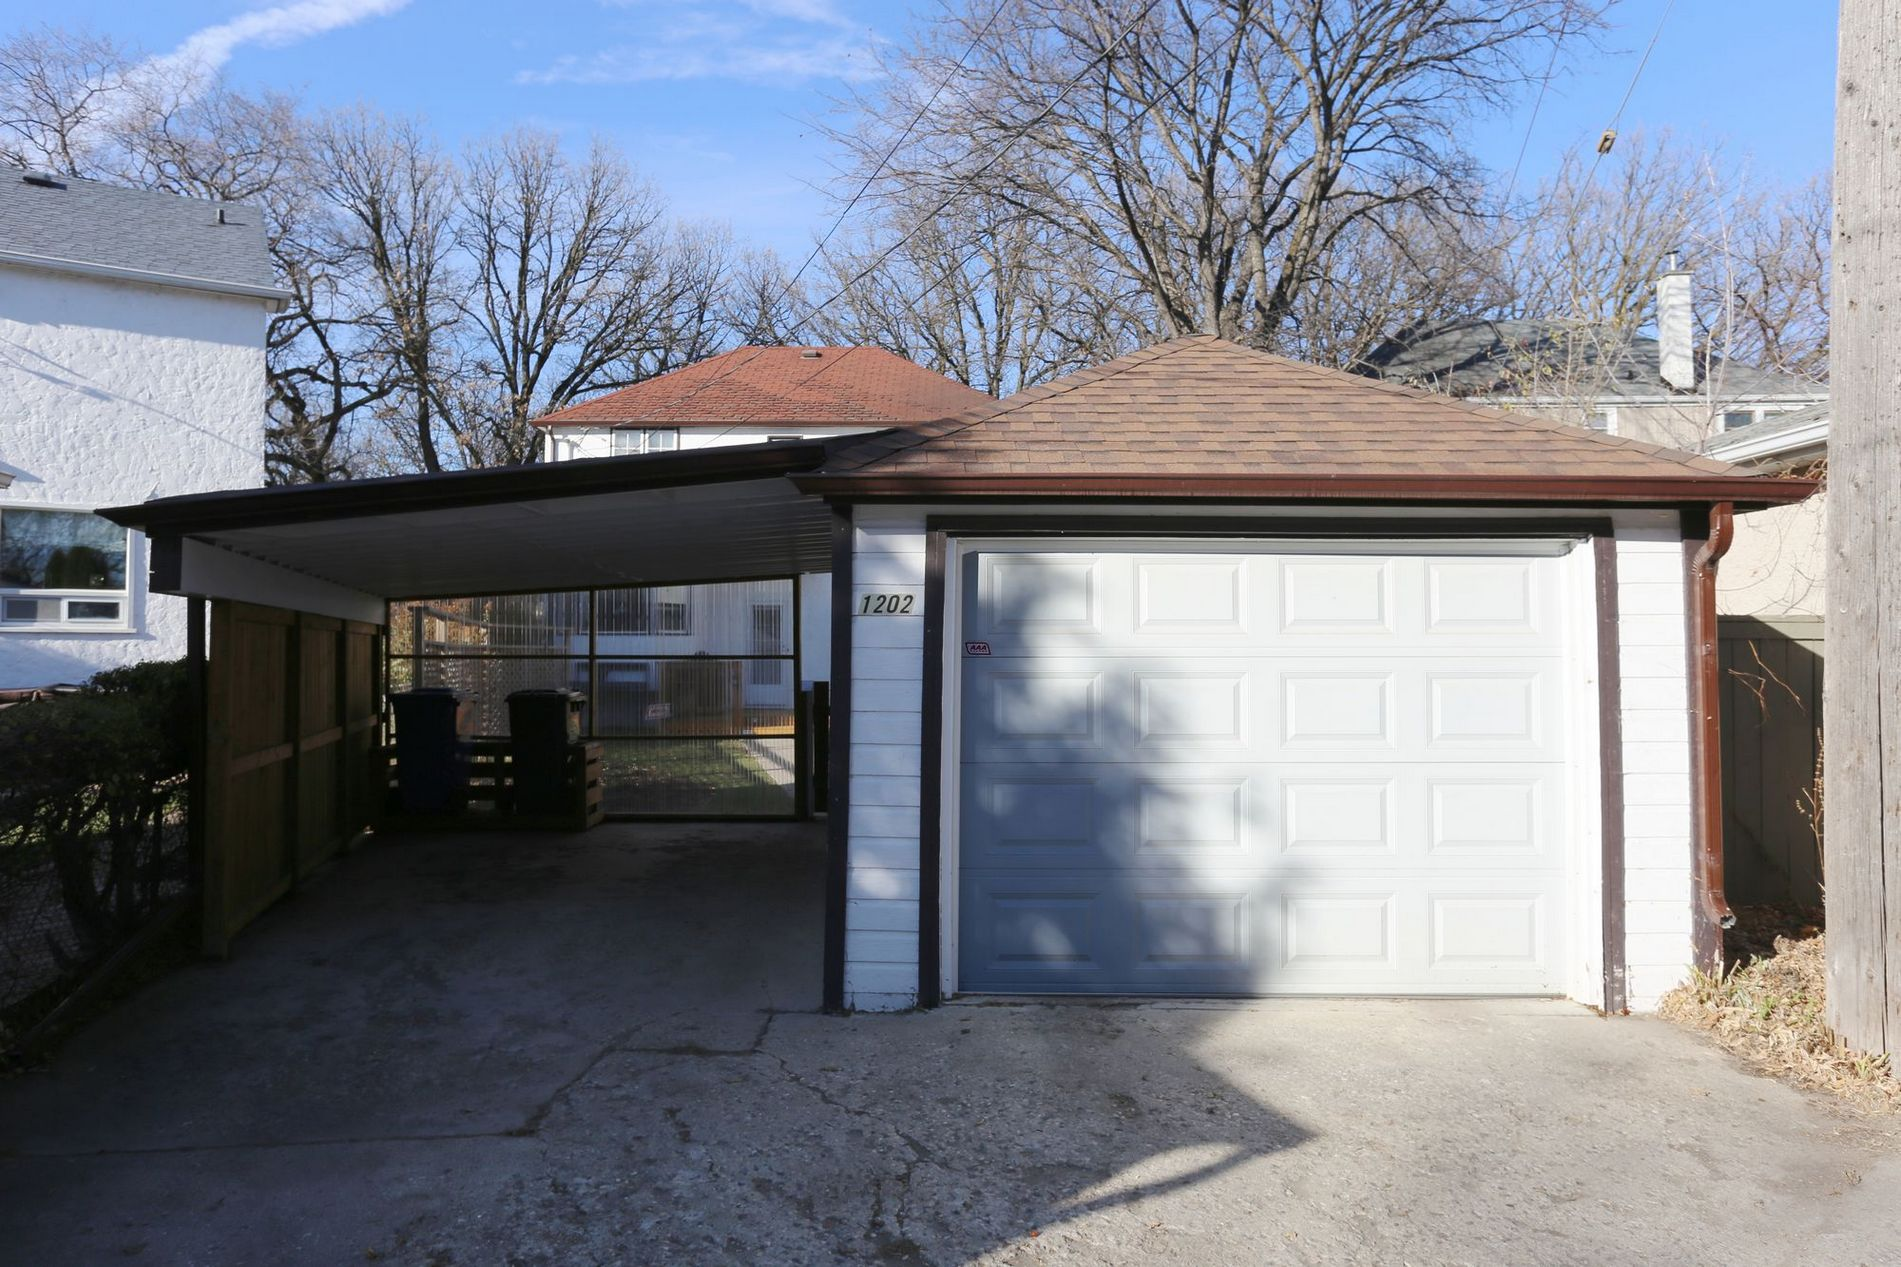 1202 Grosvenor Ave, Winnipeg, Manitoba  R3M 0P1 - Photo 24 - 1728775